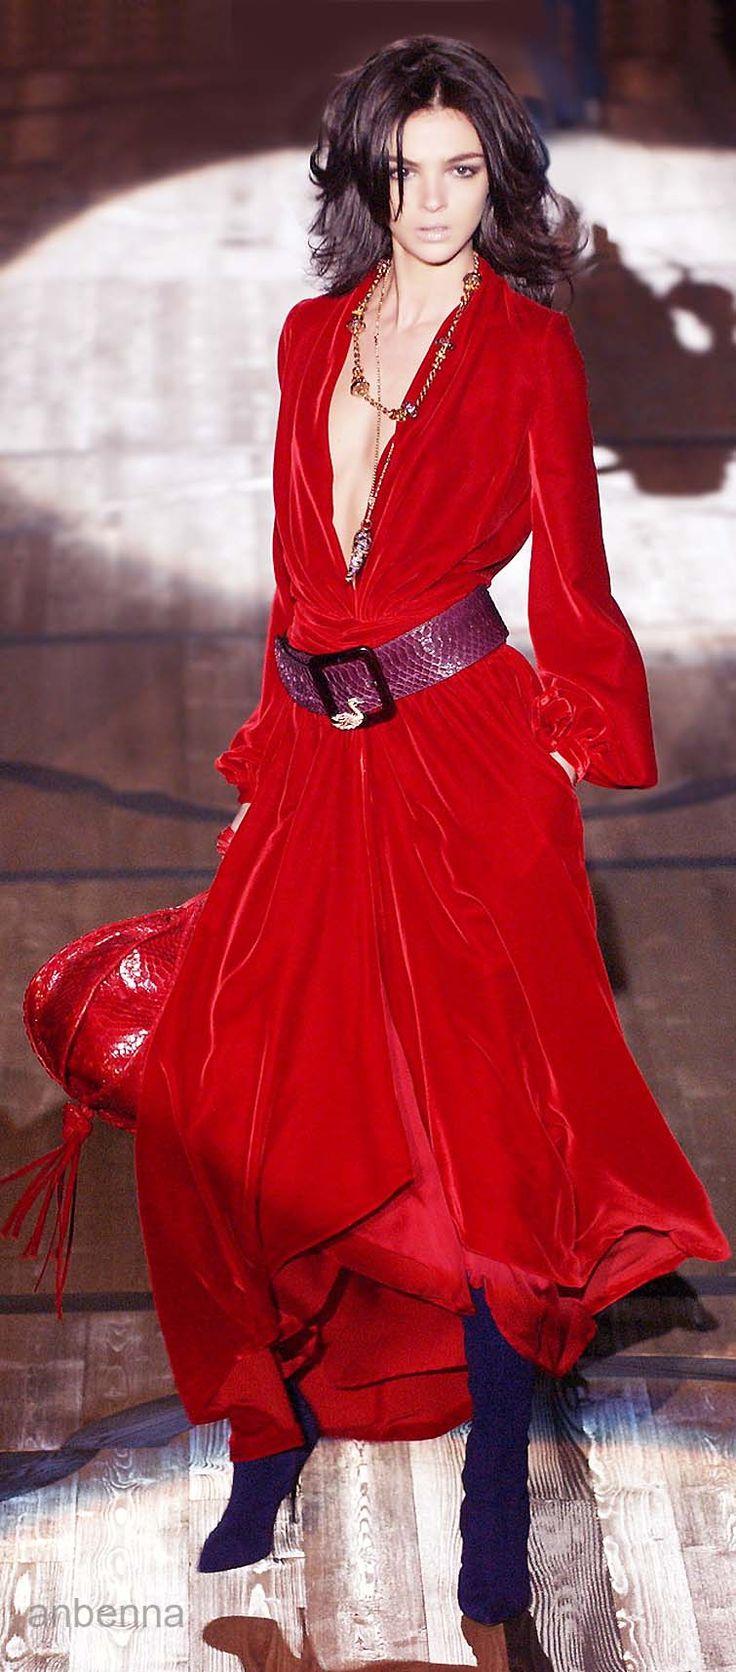 Roberto Cavalli. Red velvet. #AdeaEveryday